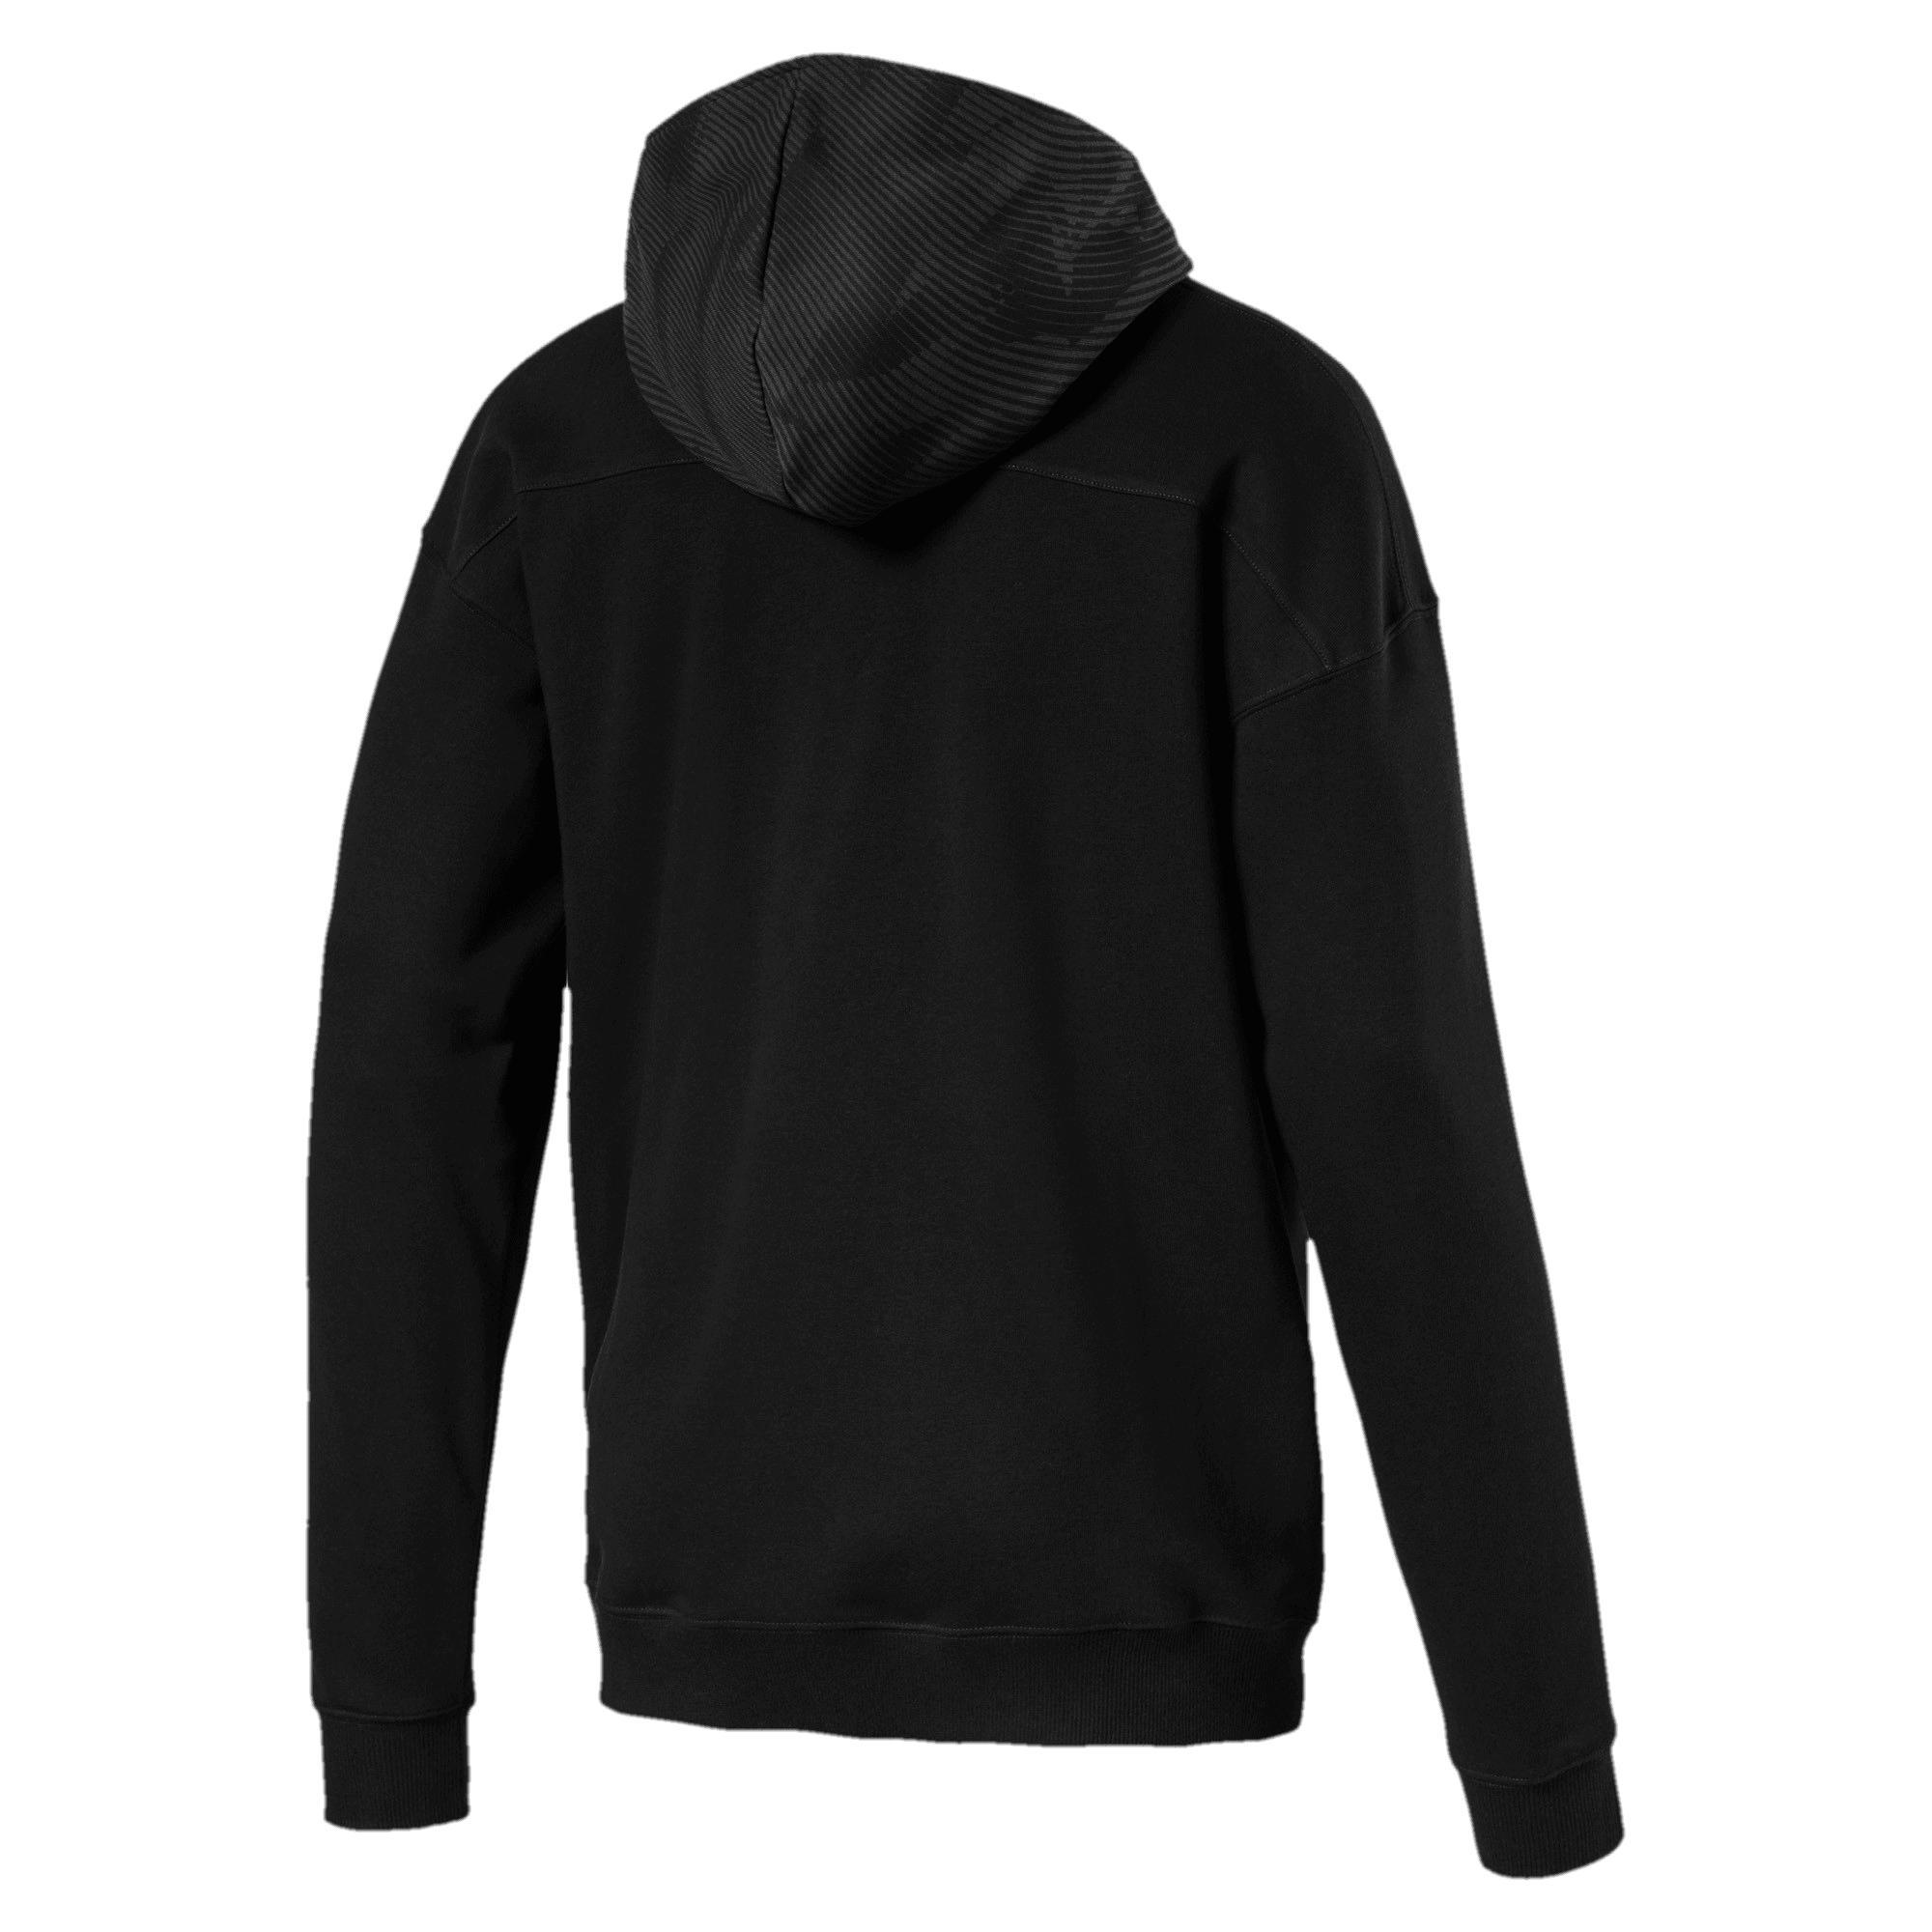 Thumbnail 5 of Borussia Mönchengladbach Casuals Men's Hooded Jacket, Puma Black-Phantom Black, medium